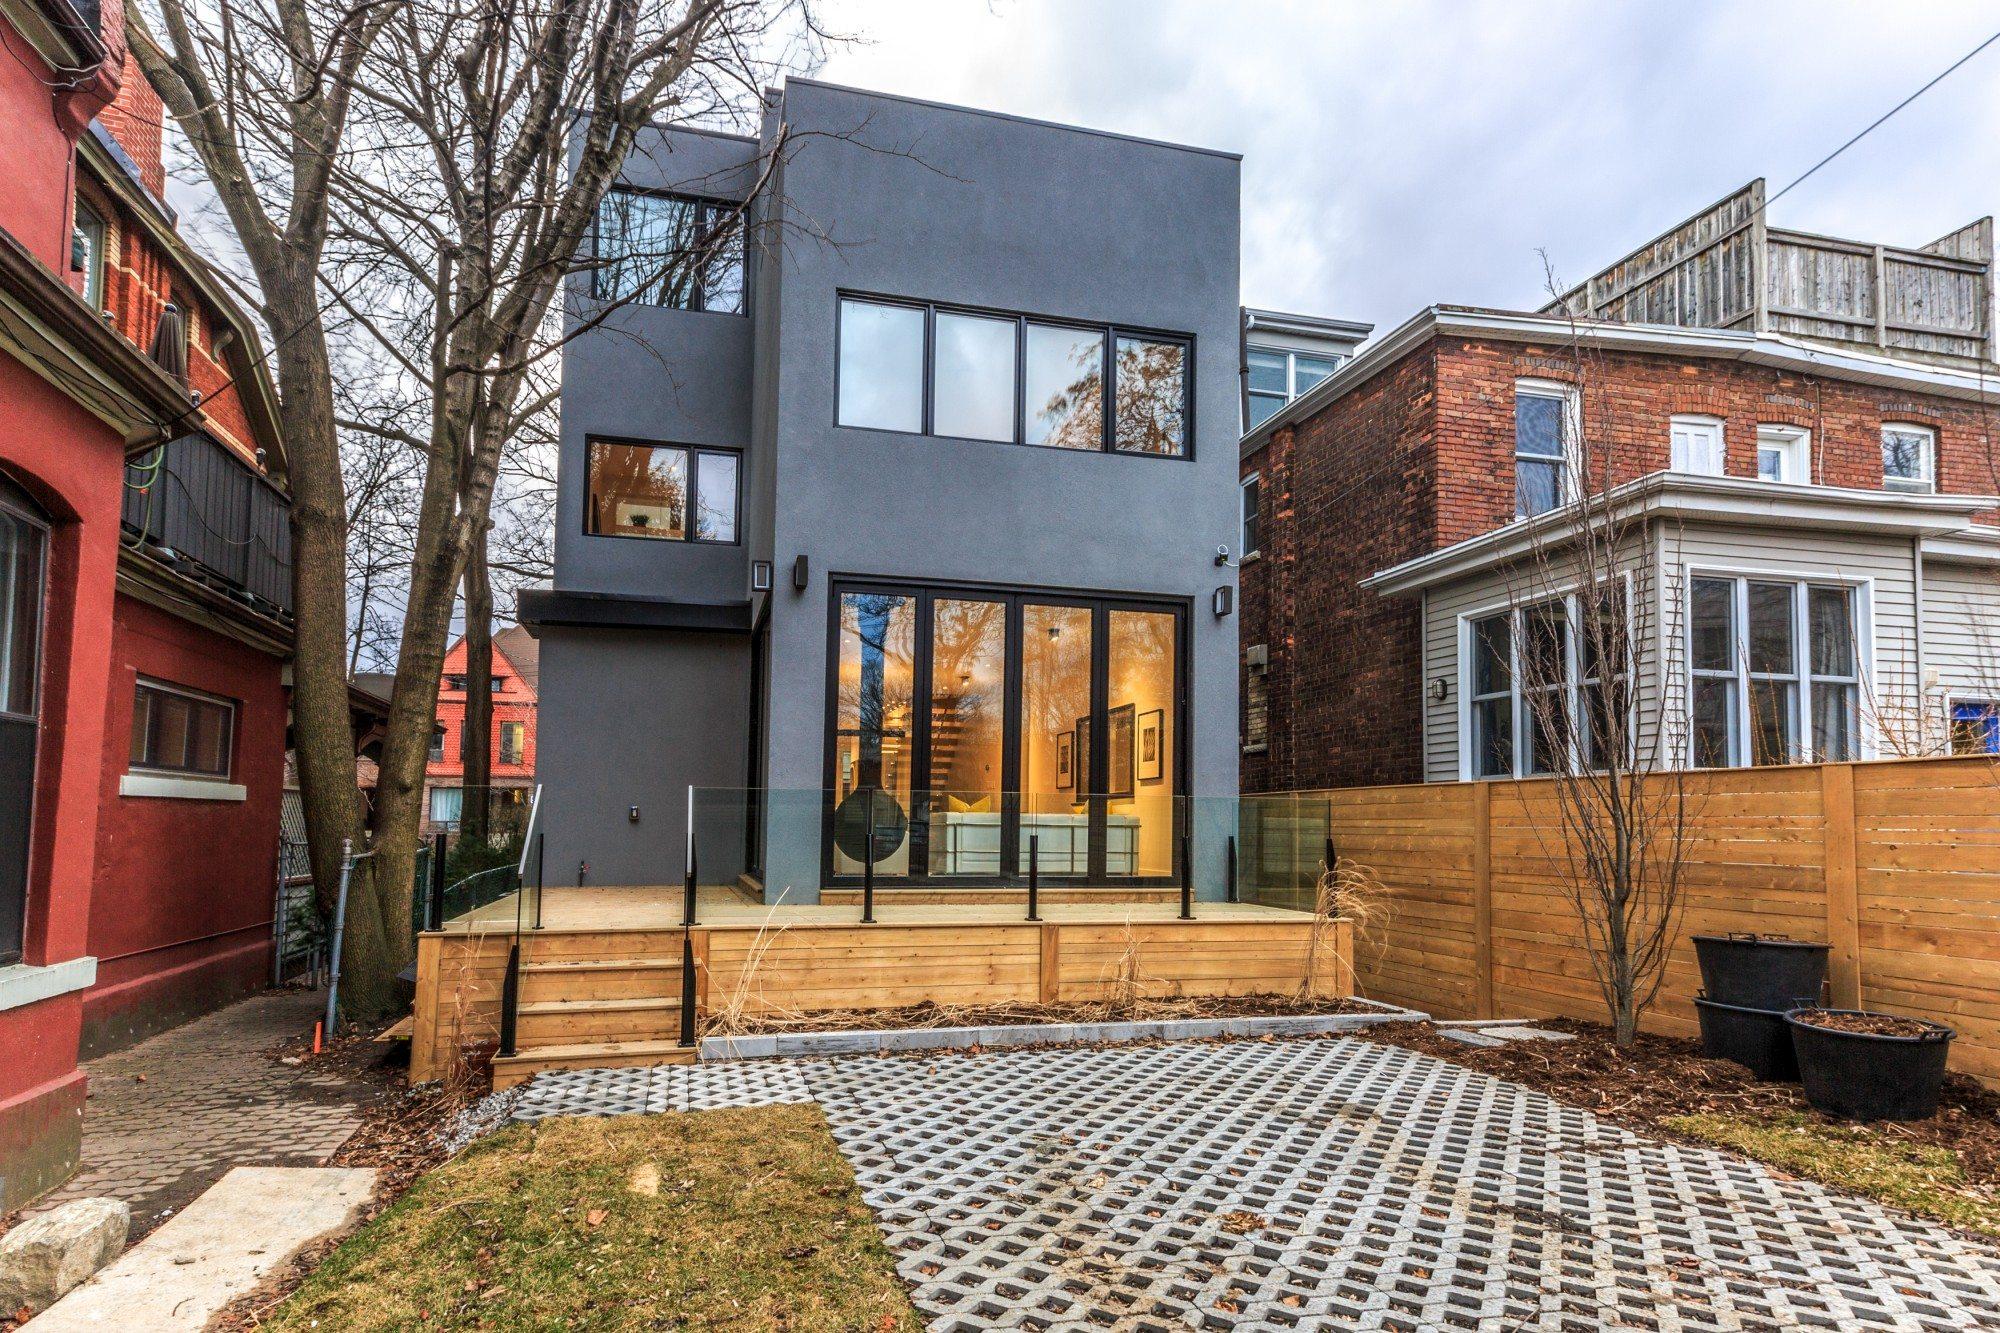 toronto-house-for-sale-73-metcalfe-street-16